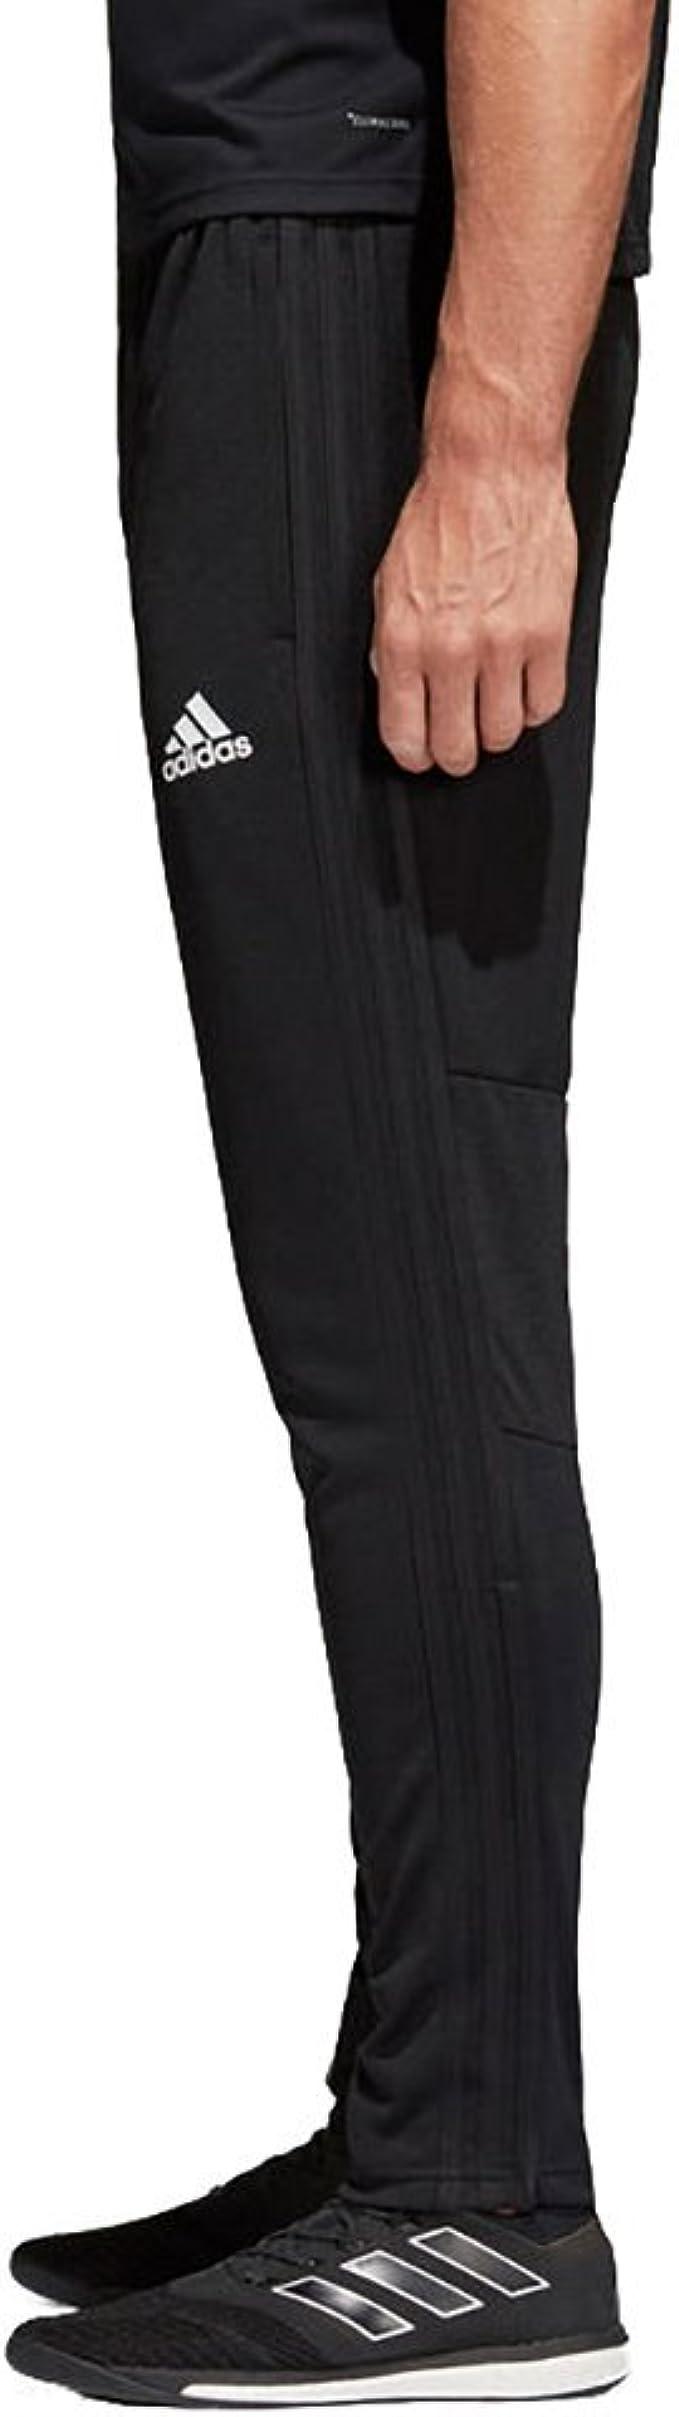 Para buscar refugio Hacia fuera Mal  adidas Men's Bs0526 Training Pants: Amazon.co.uk: Clothing